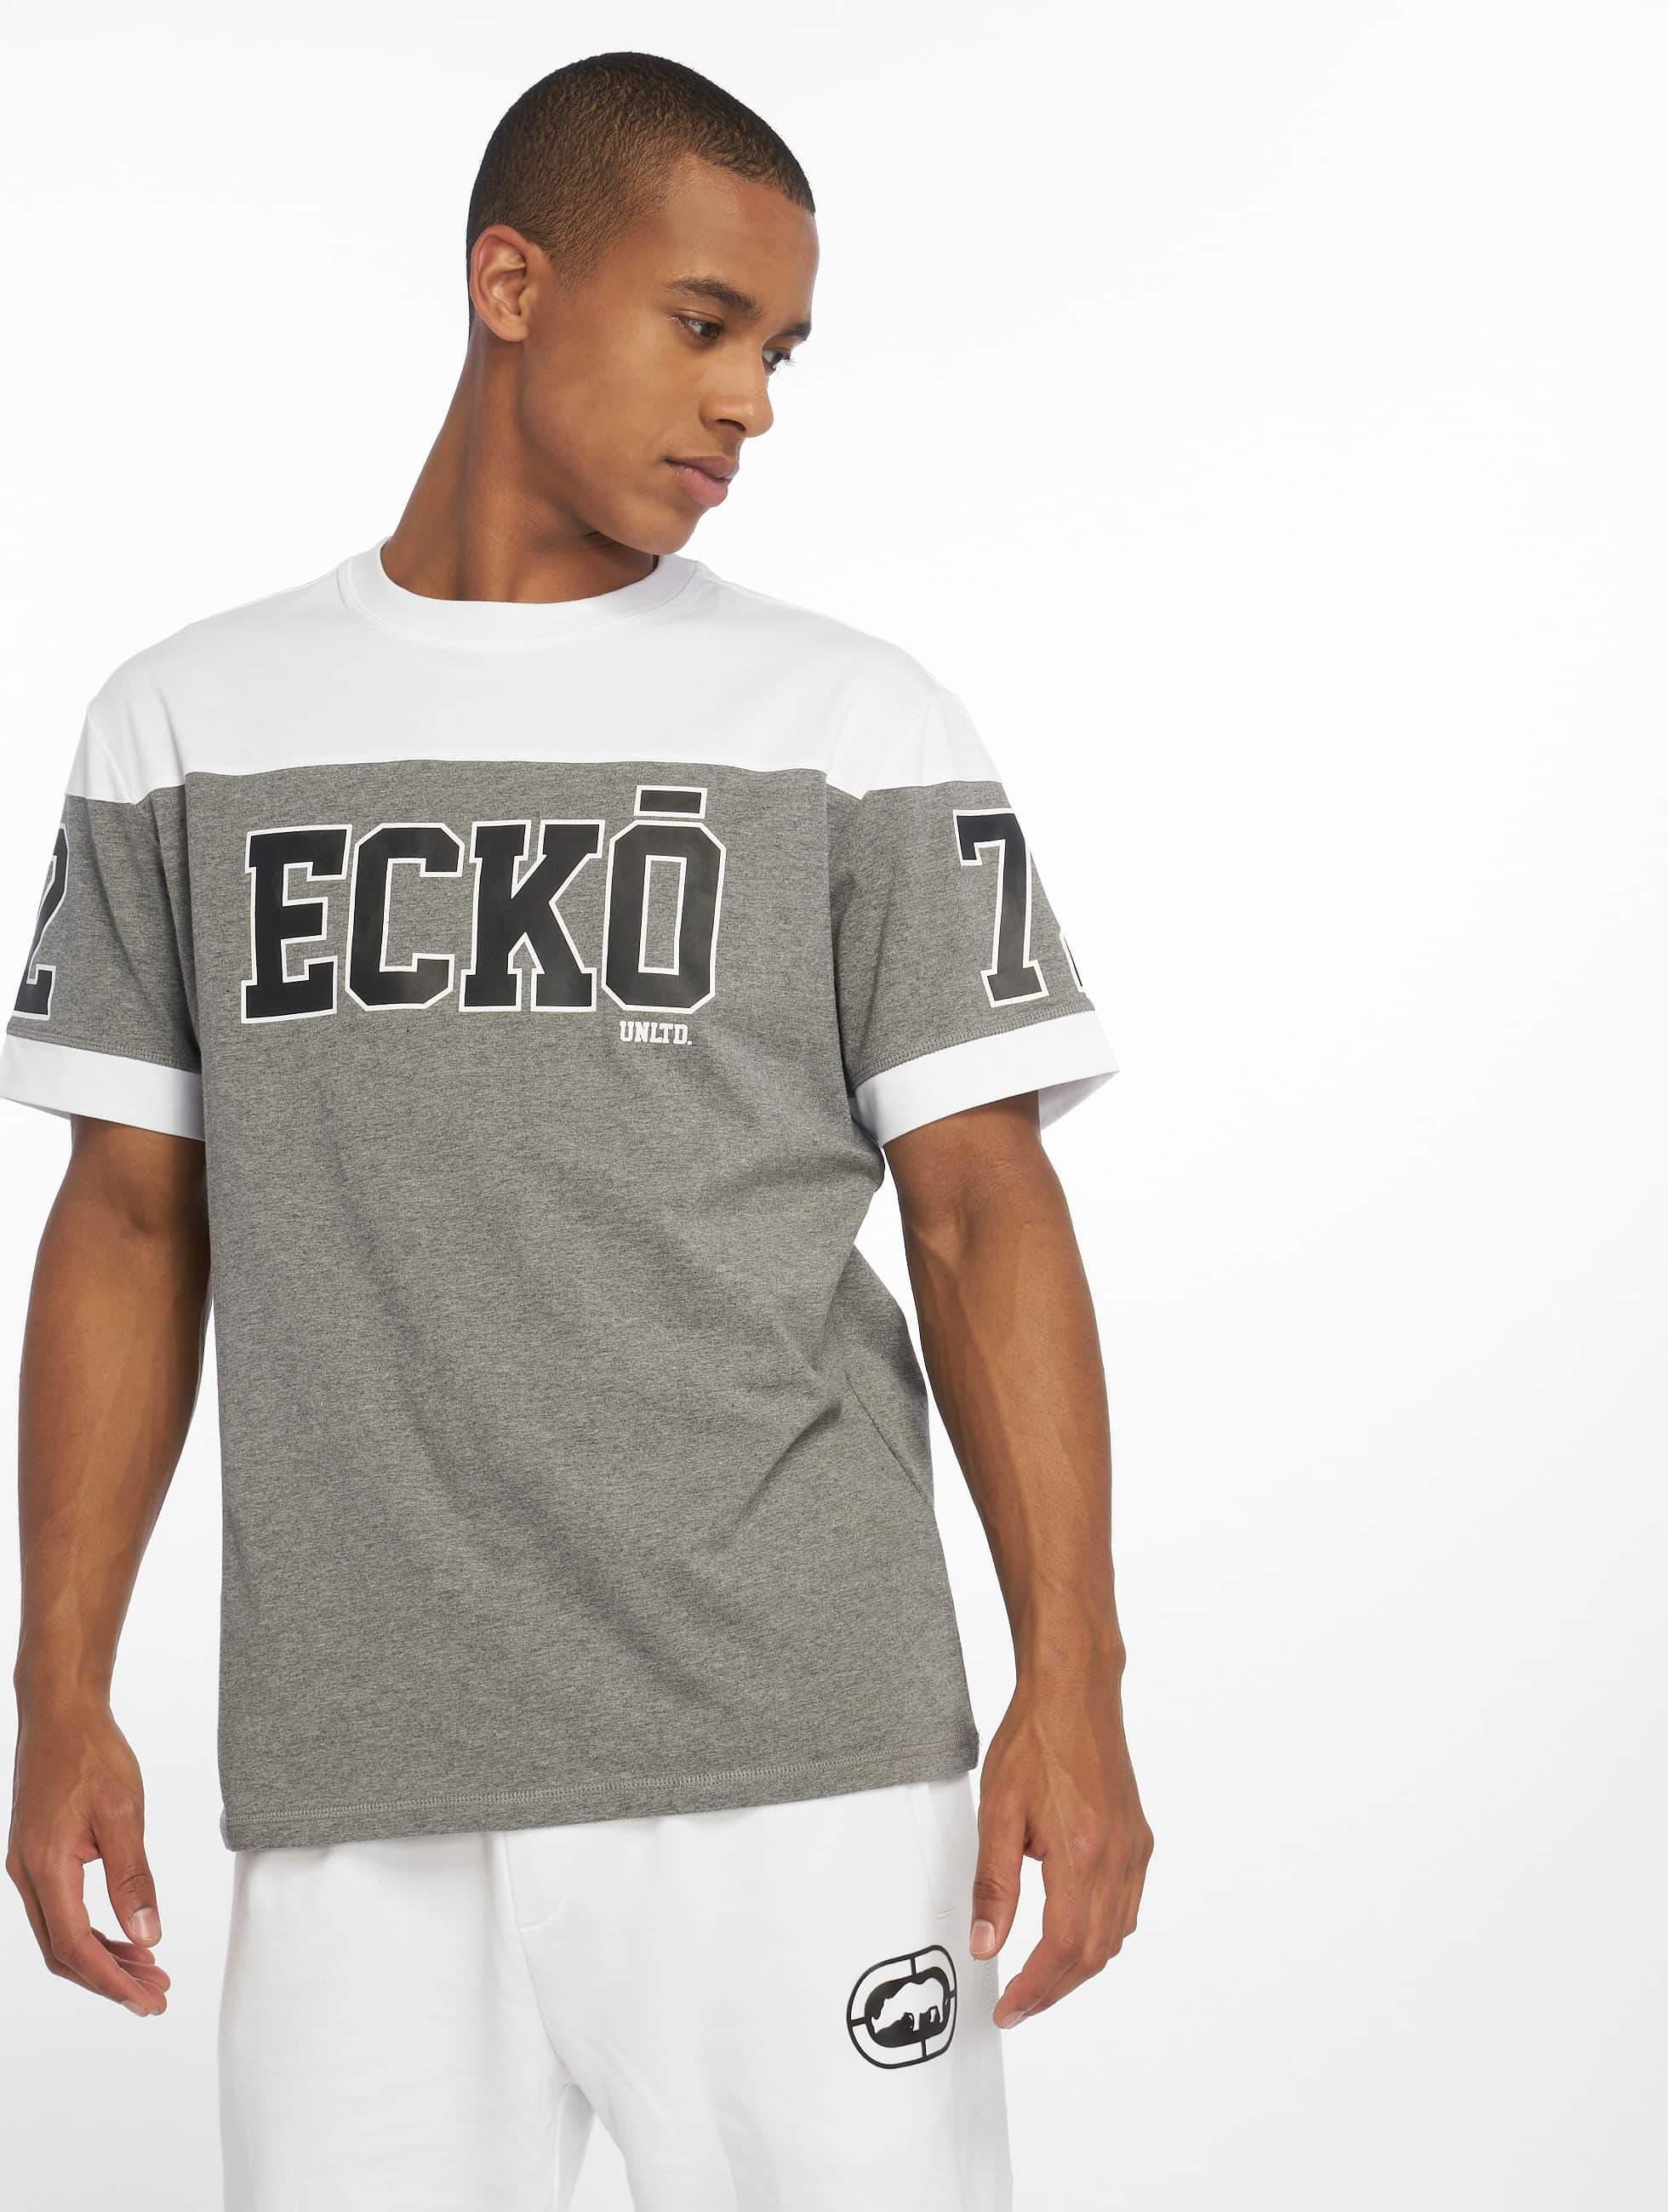 Ecko Unltd. / T-Shirt Humphreys in grey S